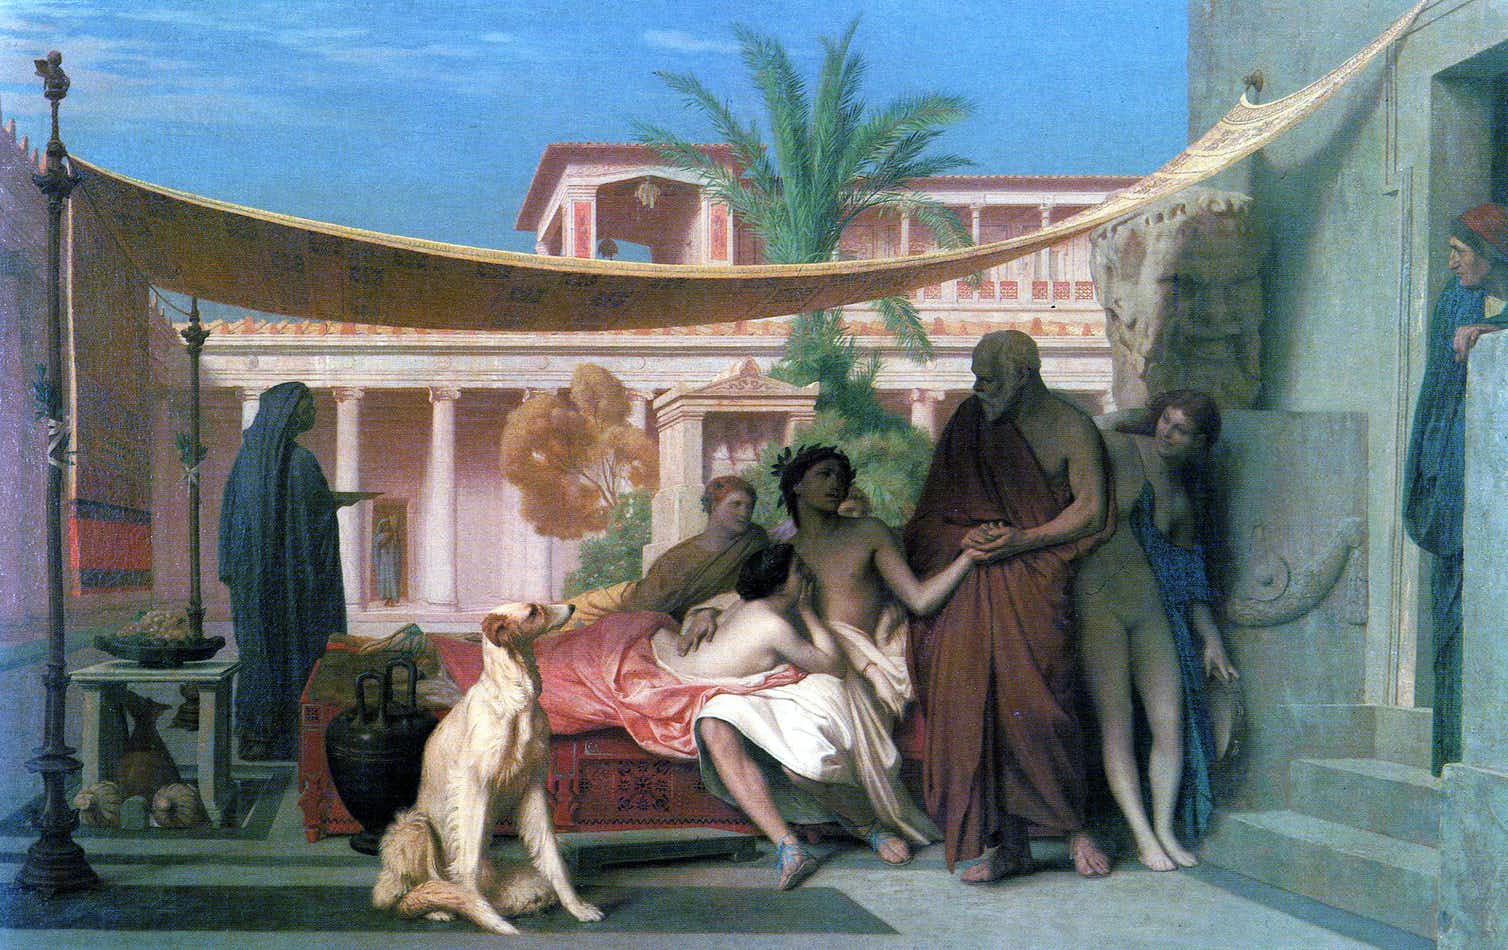 Socrates seeking Alcibiades in the house of Aspasia, Jean-Léon Gérôme, 1861. Credit: Wikimedia Commons